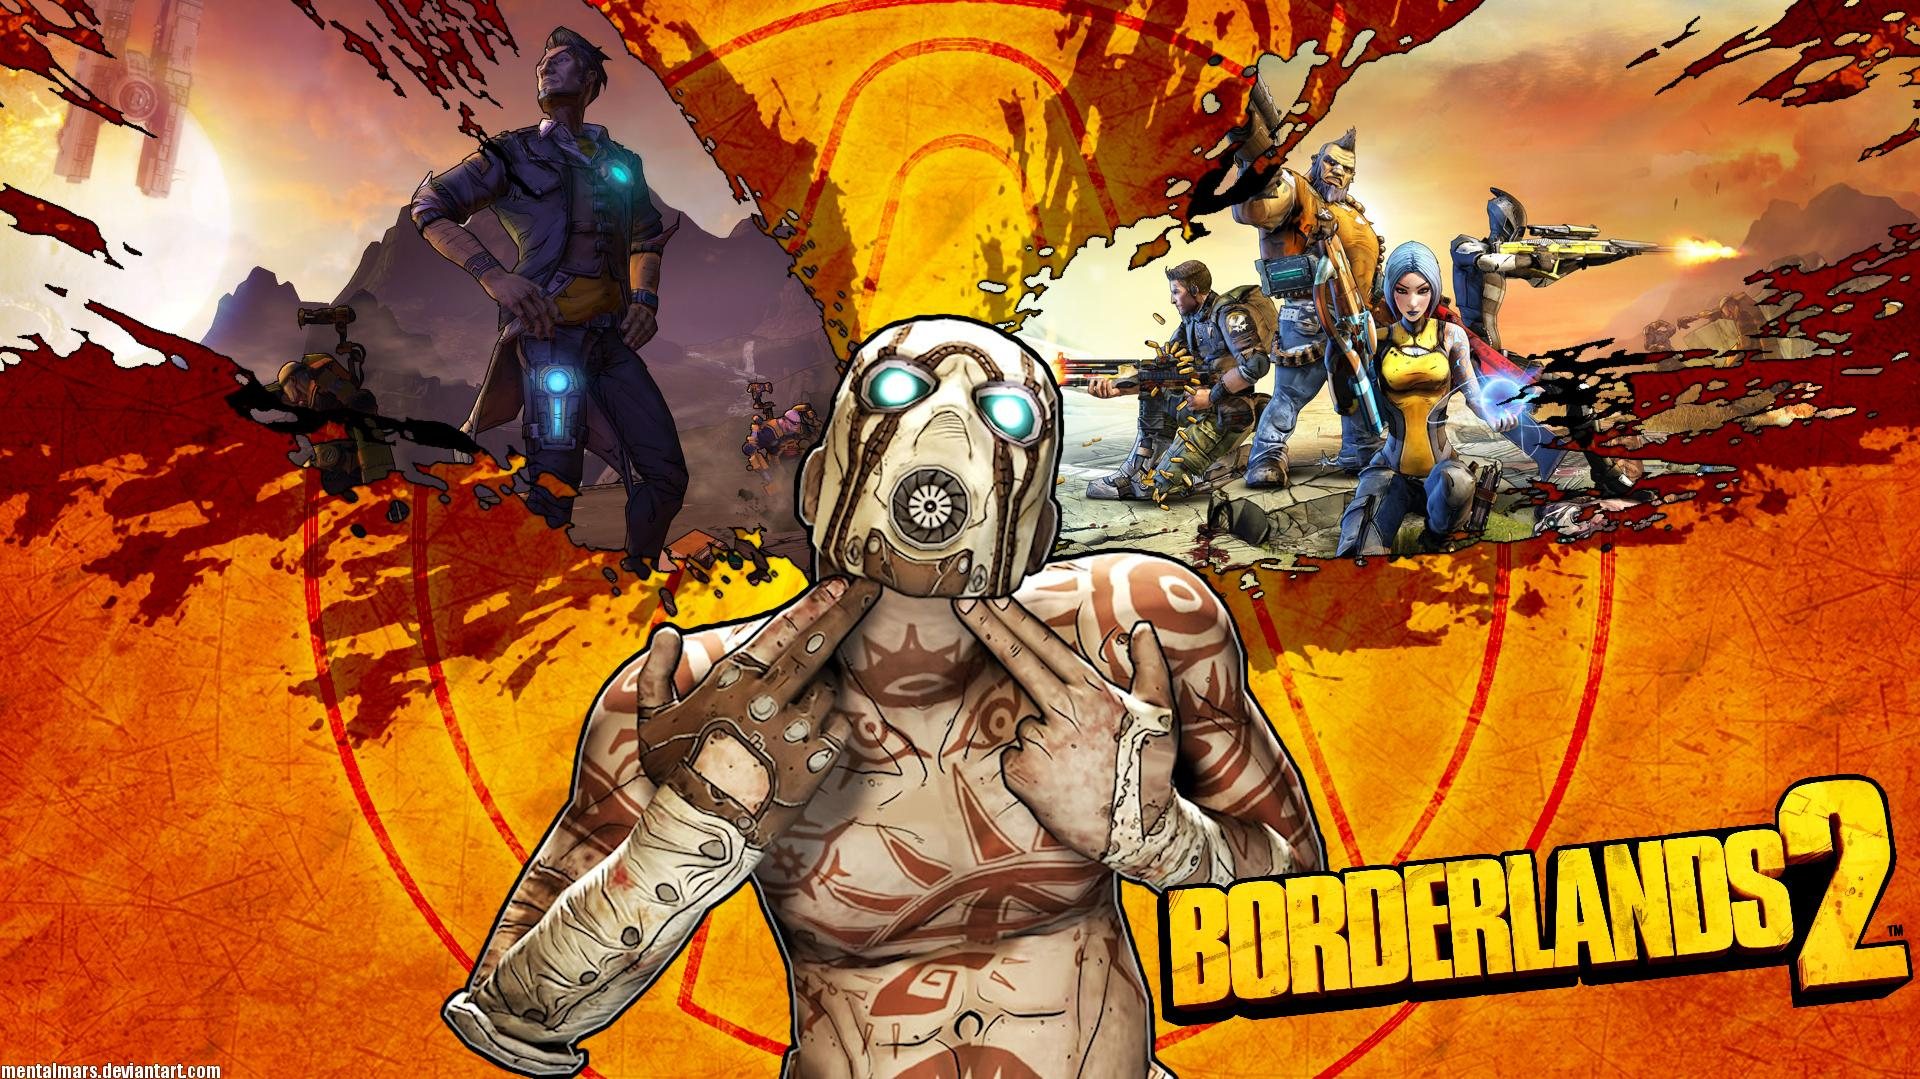 Borderlands 2 - Ultimate Vault Hunter Upgrade Pack 2 - The Raid of Digistruct Peak Walkthrough